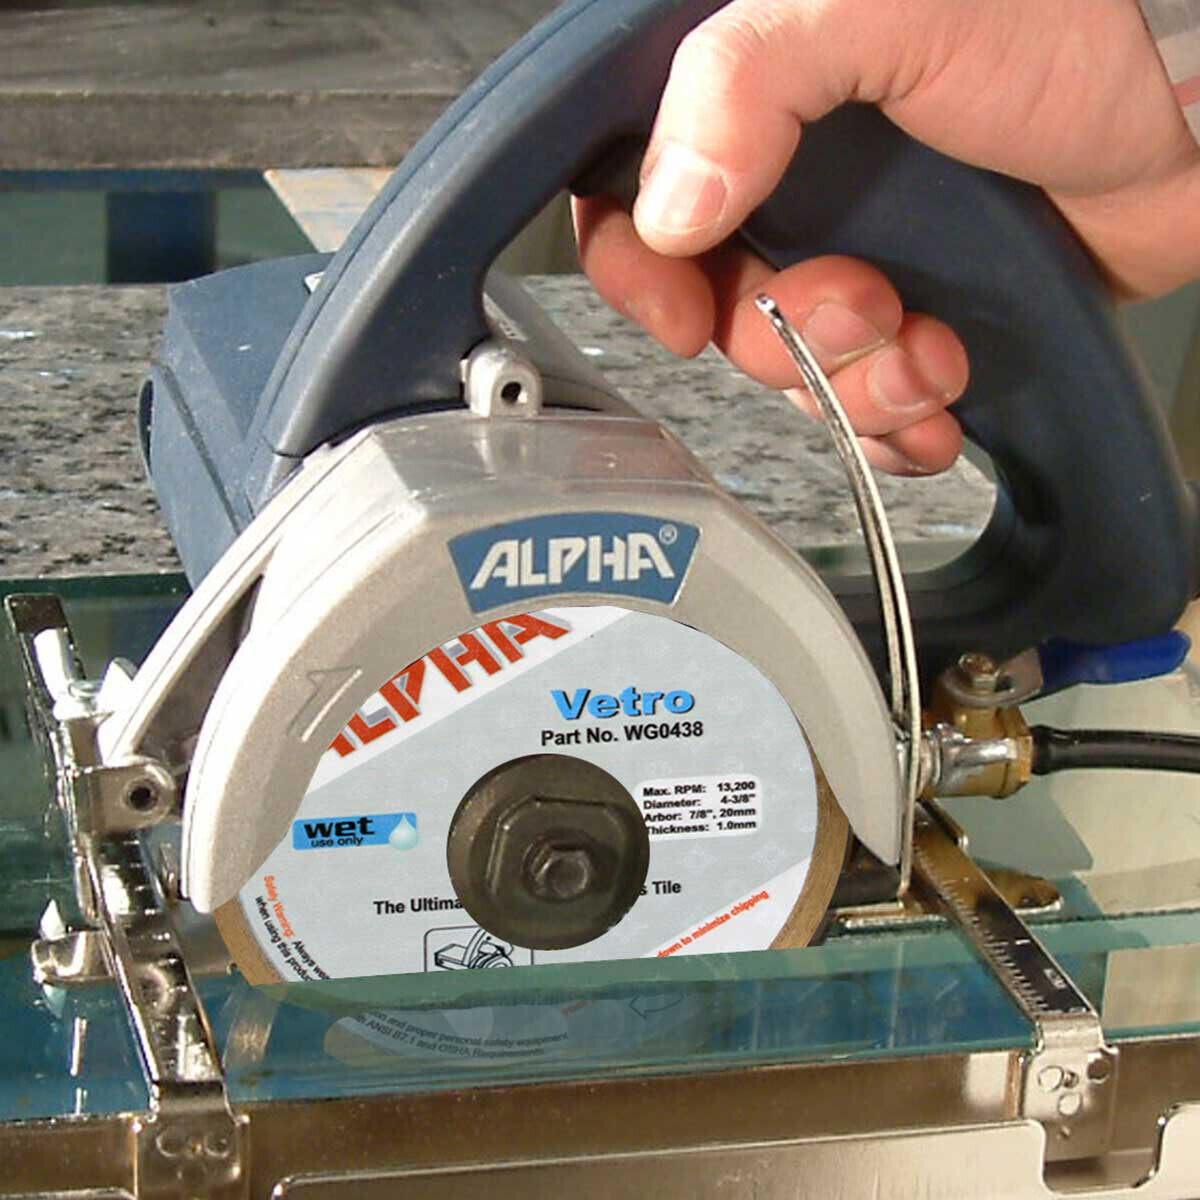 Alpha Vetro cutting Glass circular saw